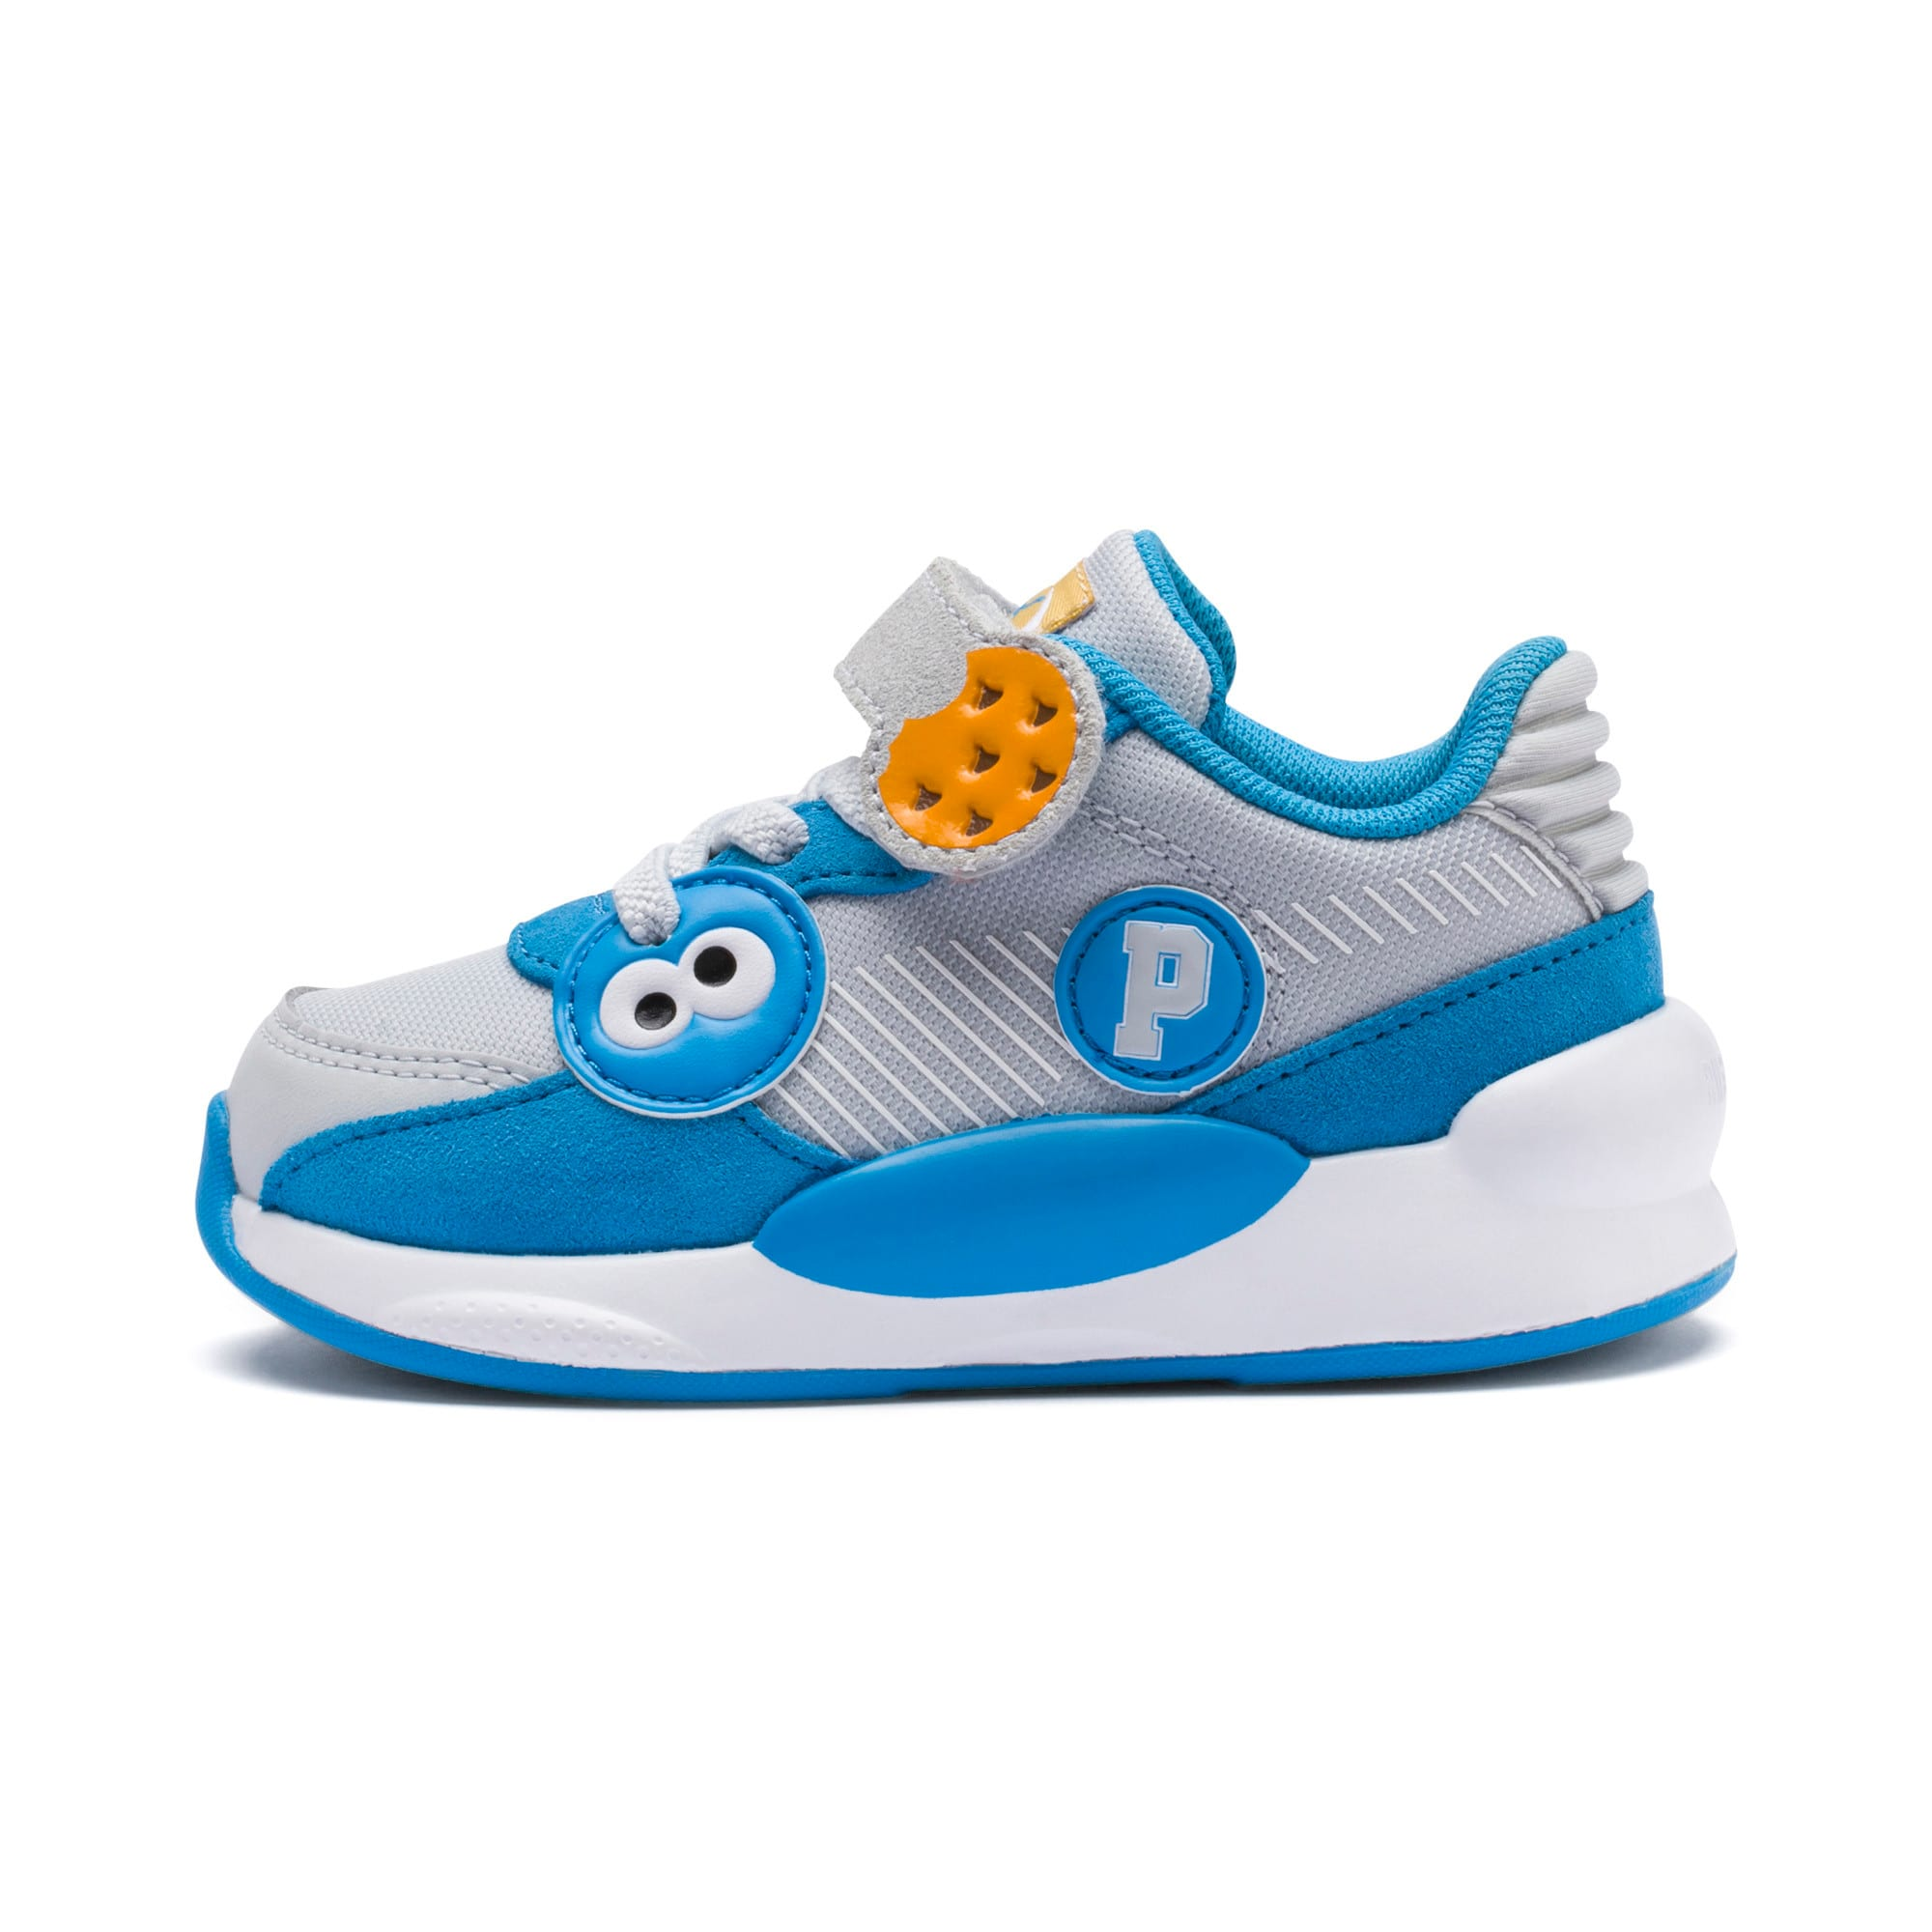 Thumbnail 1 of PUMA x SESAME STREET 50 RS 9.8 Toddler Shoes, Grey Dawn-Bleu Azur, medium